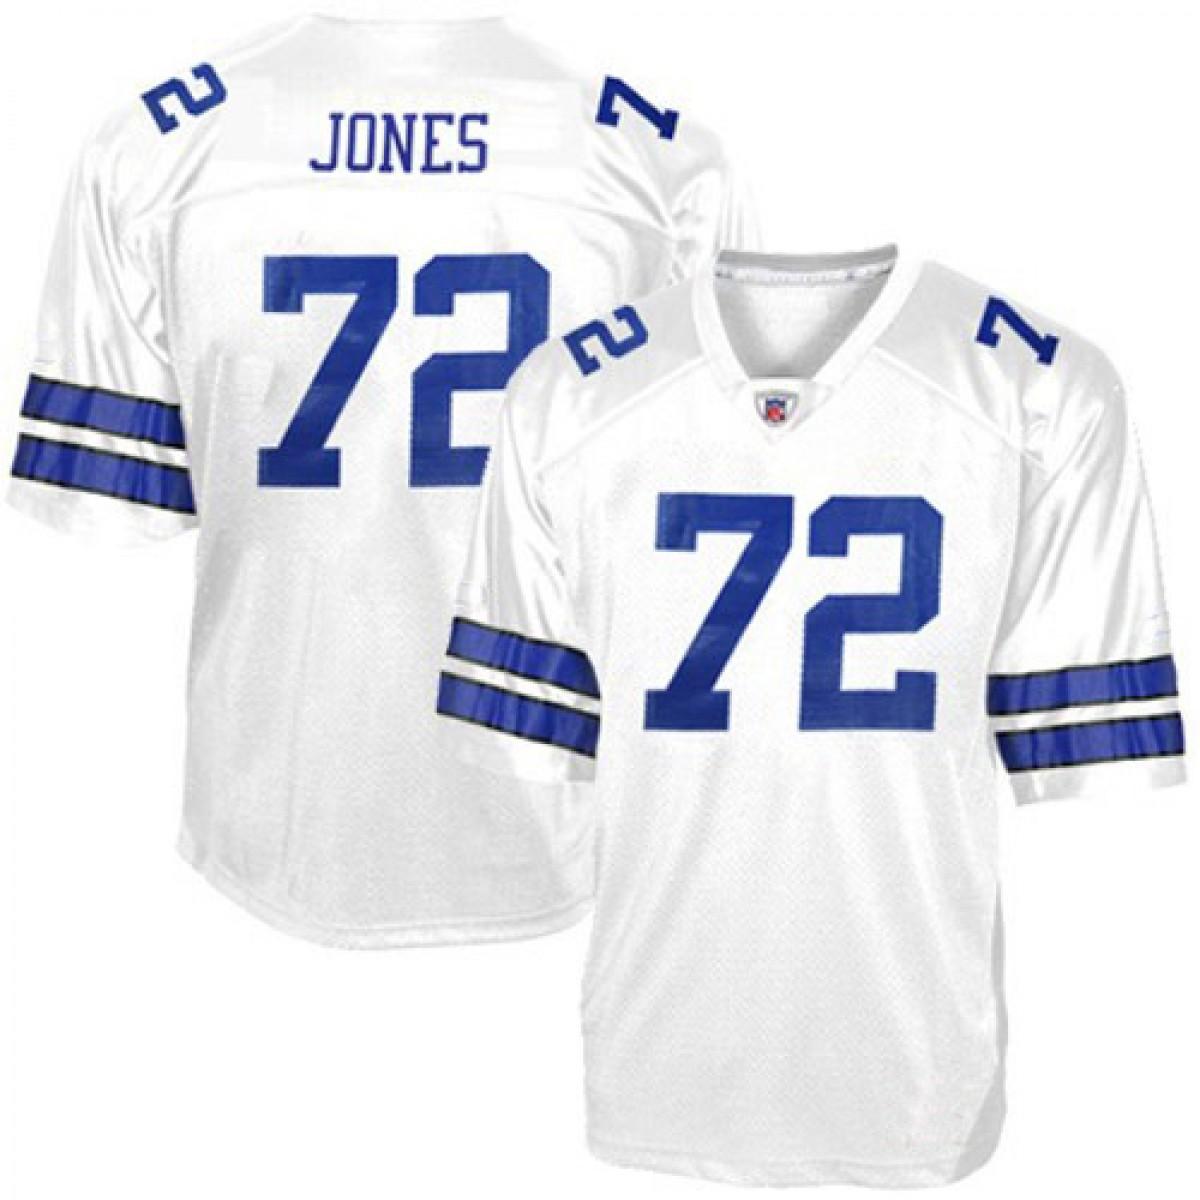 watch b02bb f4bc0 NFL Dallas Cowboys 72 E Jones White Football Men Jersey